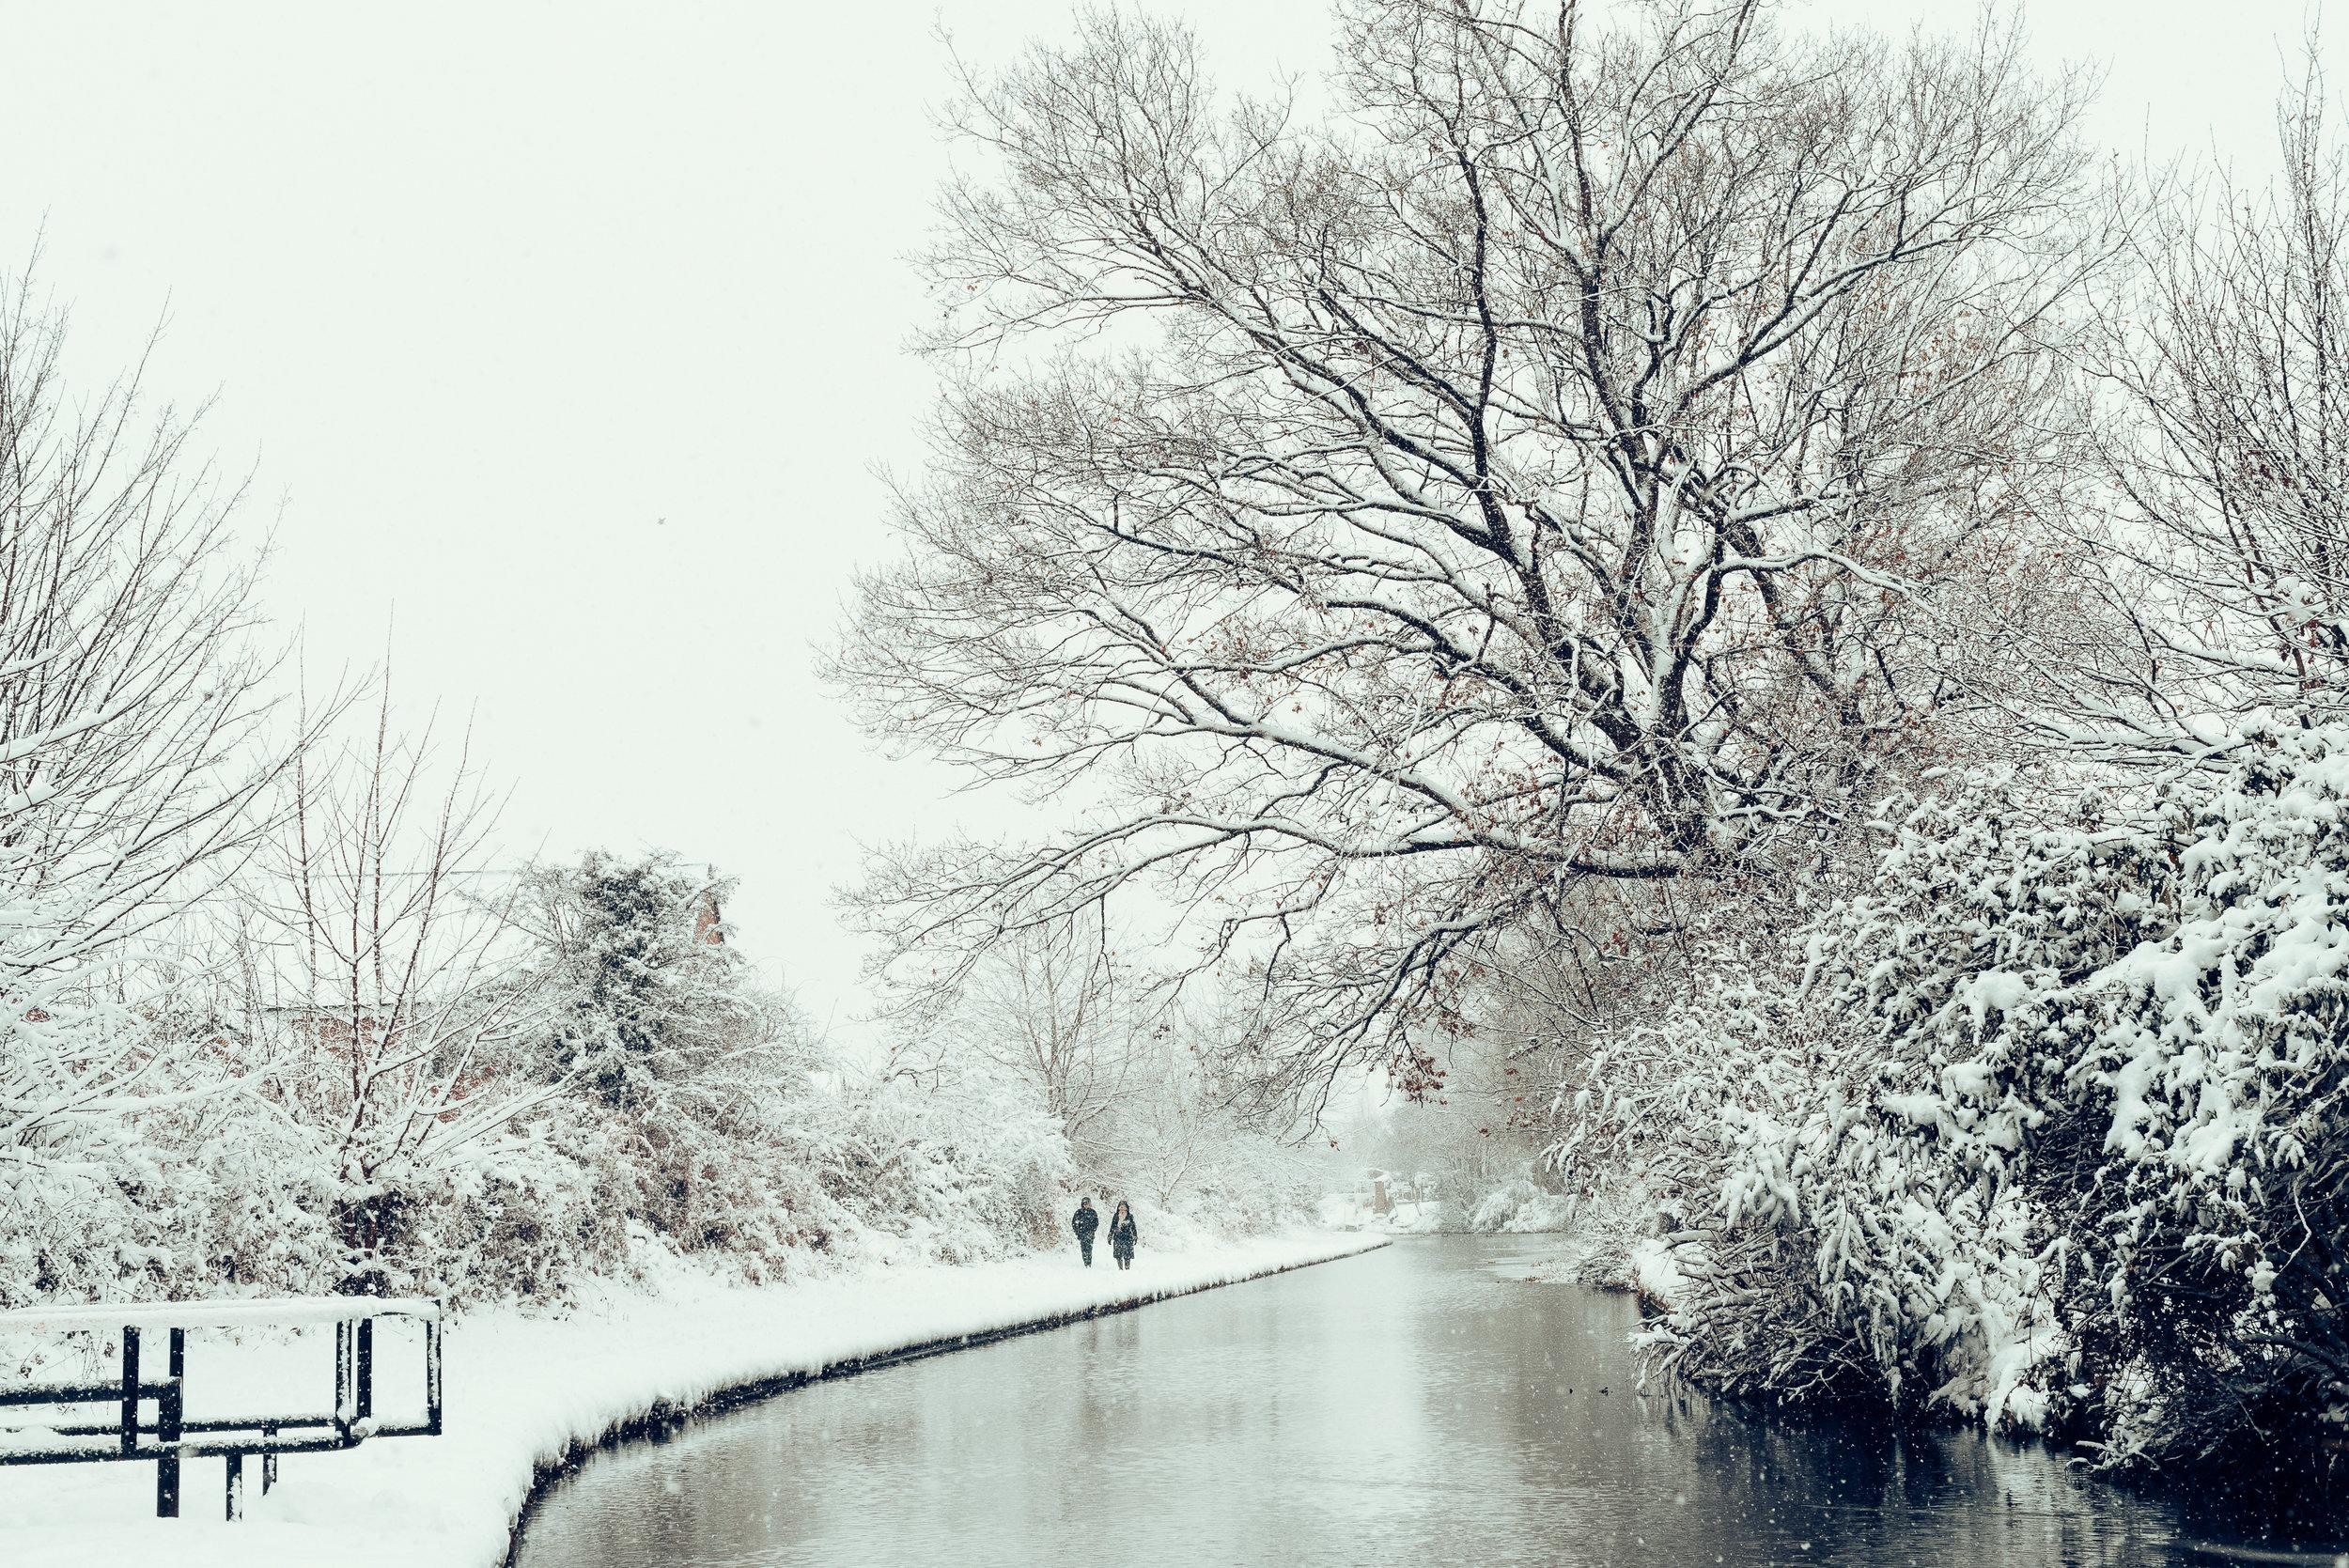 Birmingham-Snow-20171210-0007-Hanny-Foxhall.jpg